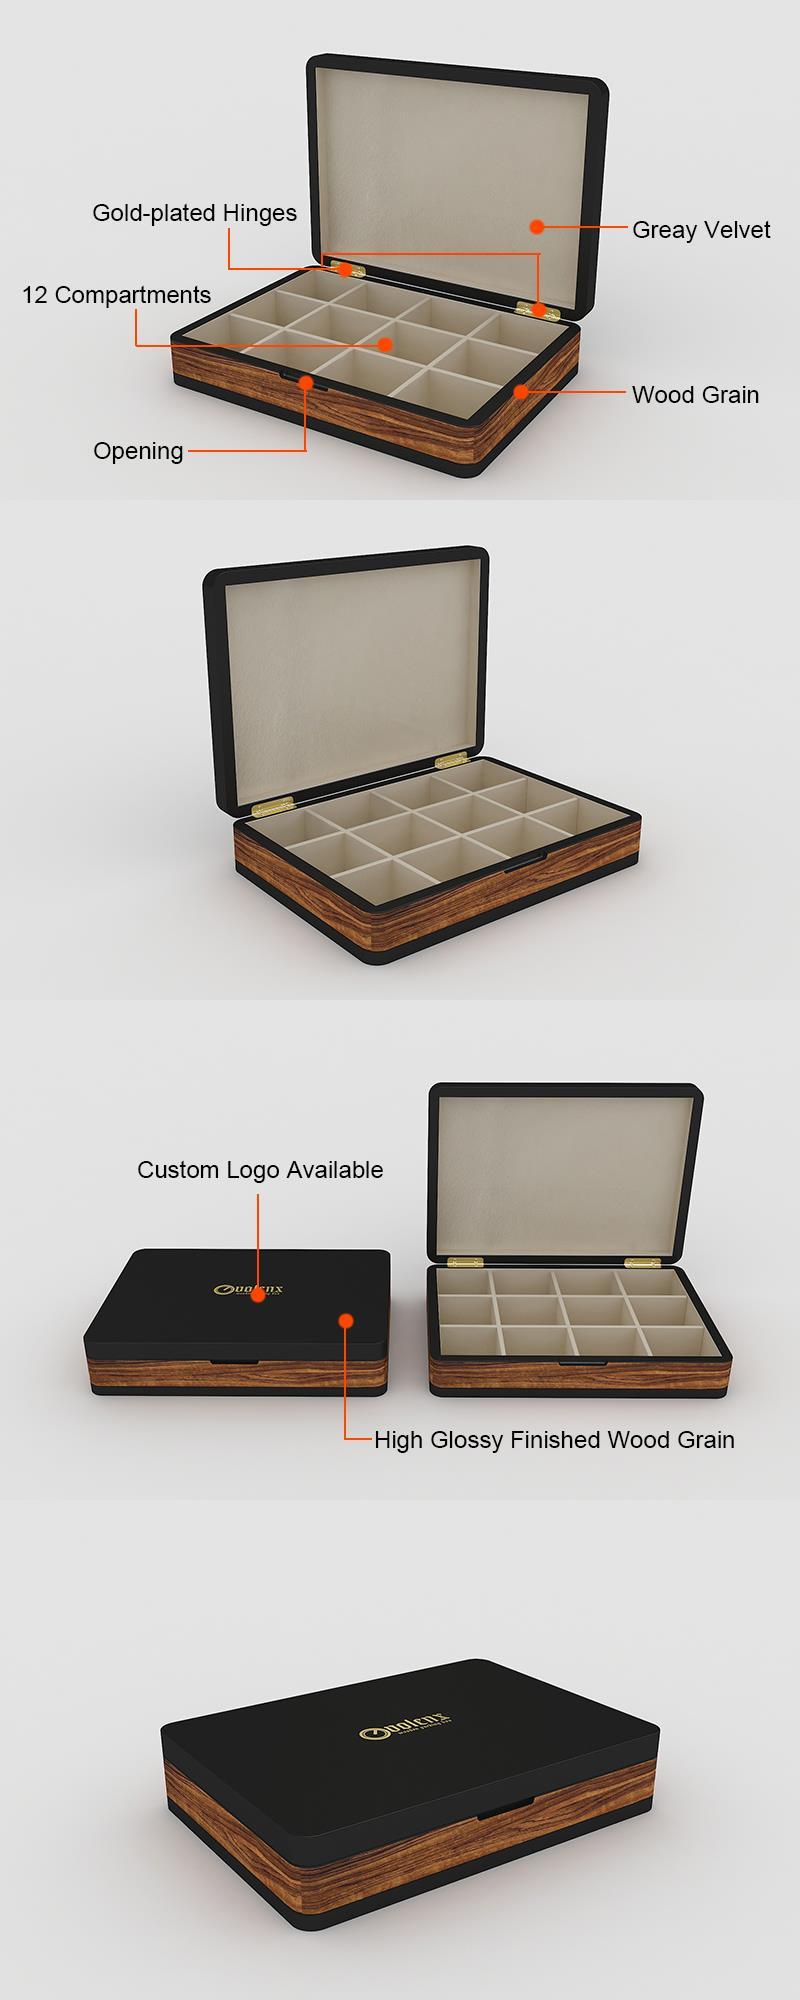 drvena kutija za skladištenje čaja